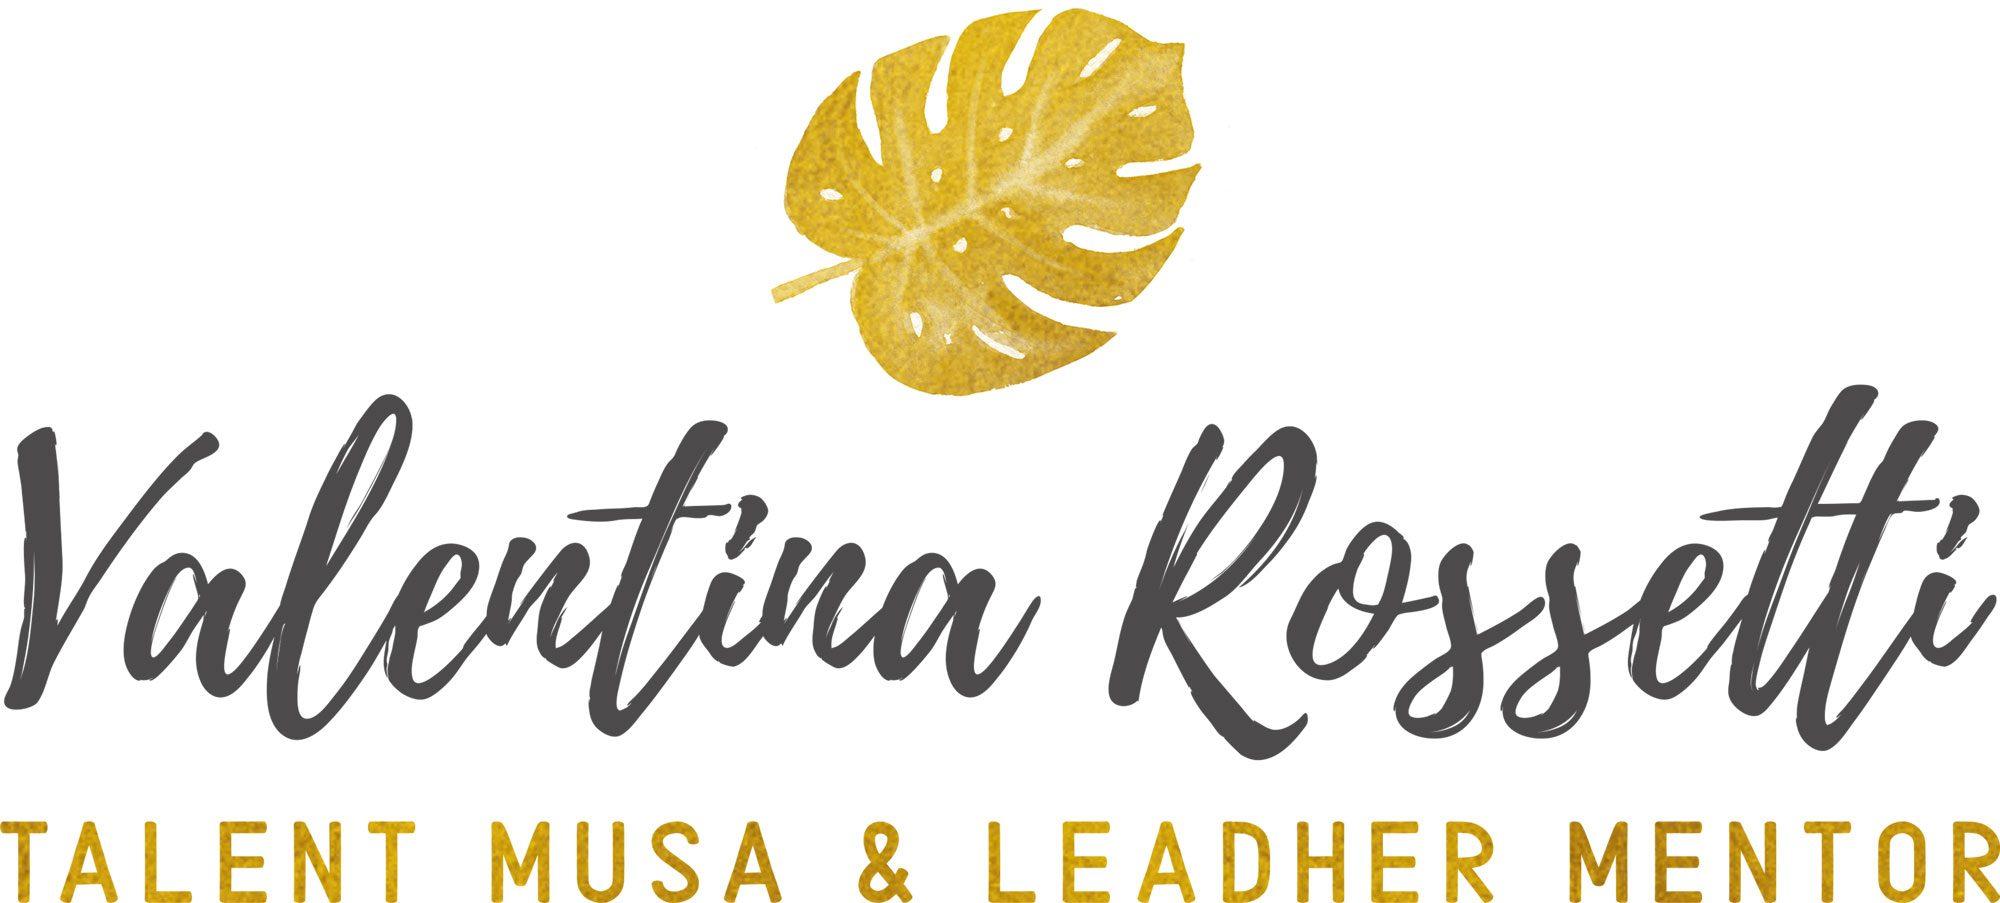 Valentina Rossetti